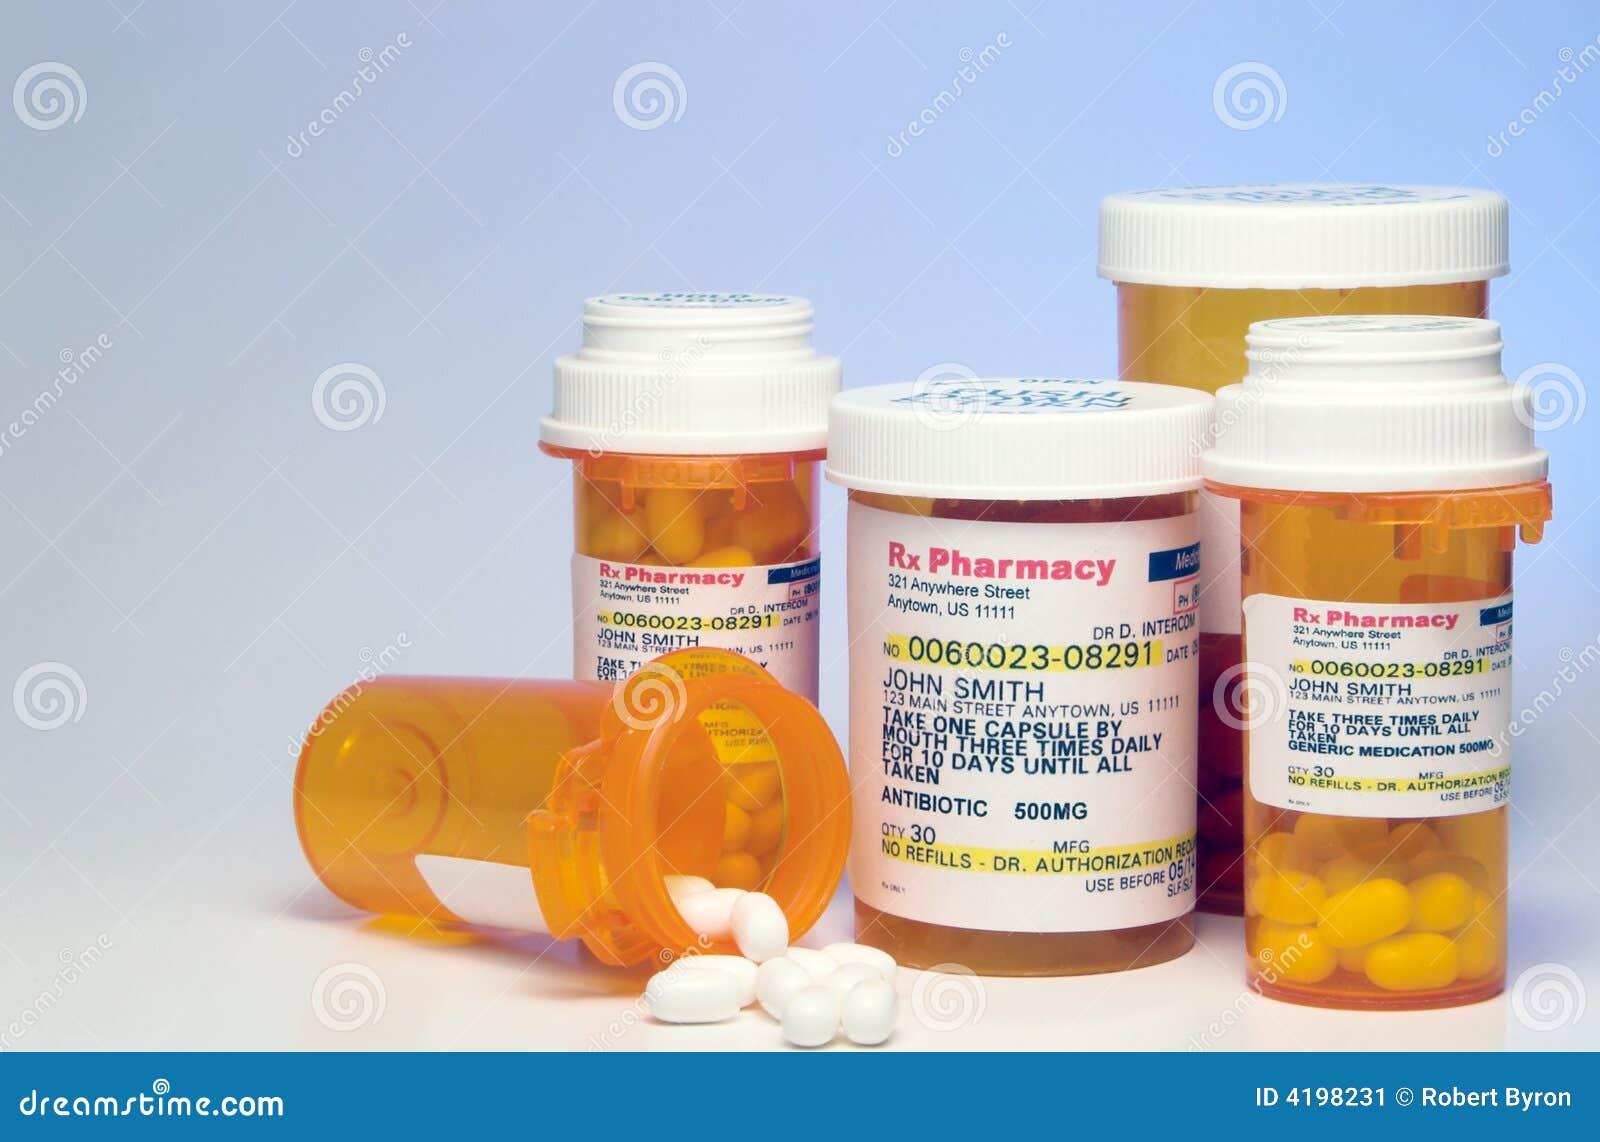 Prescription Medication Stock Image - Image: 4198231